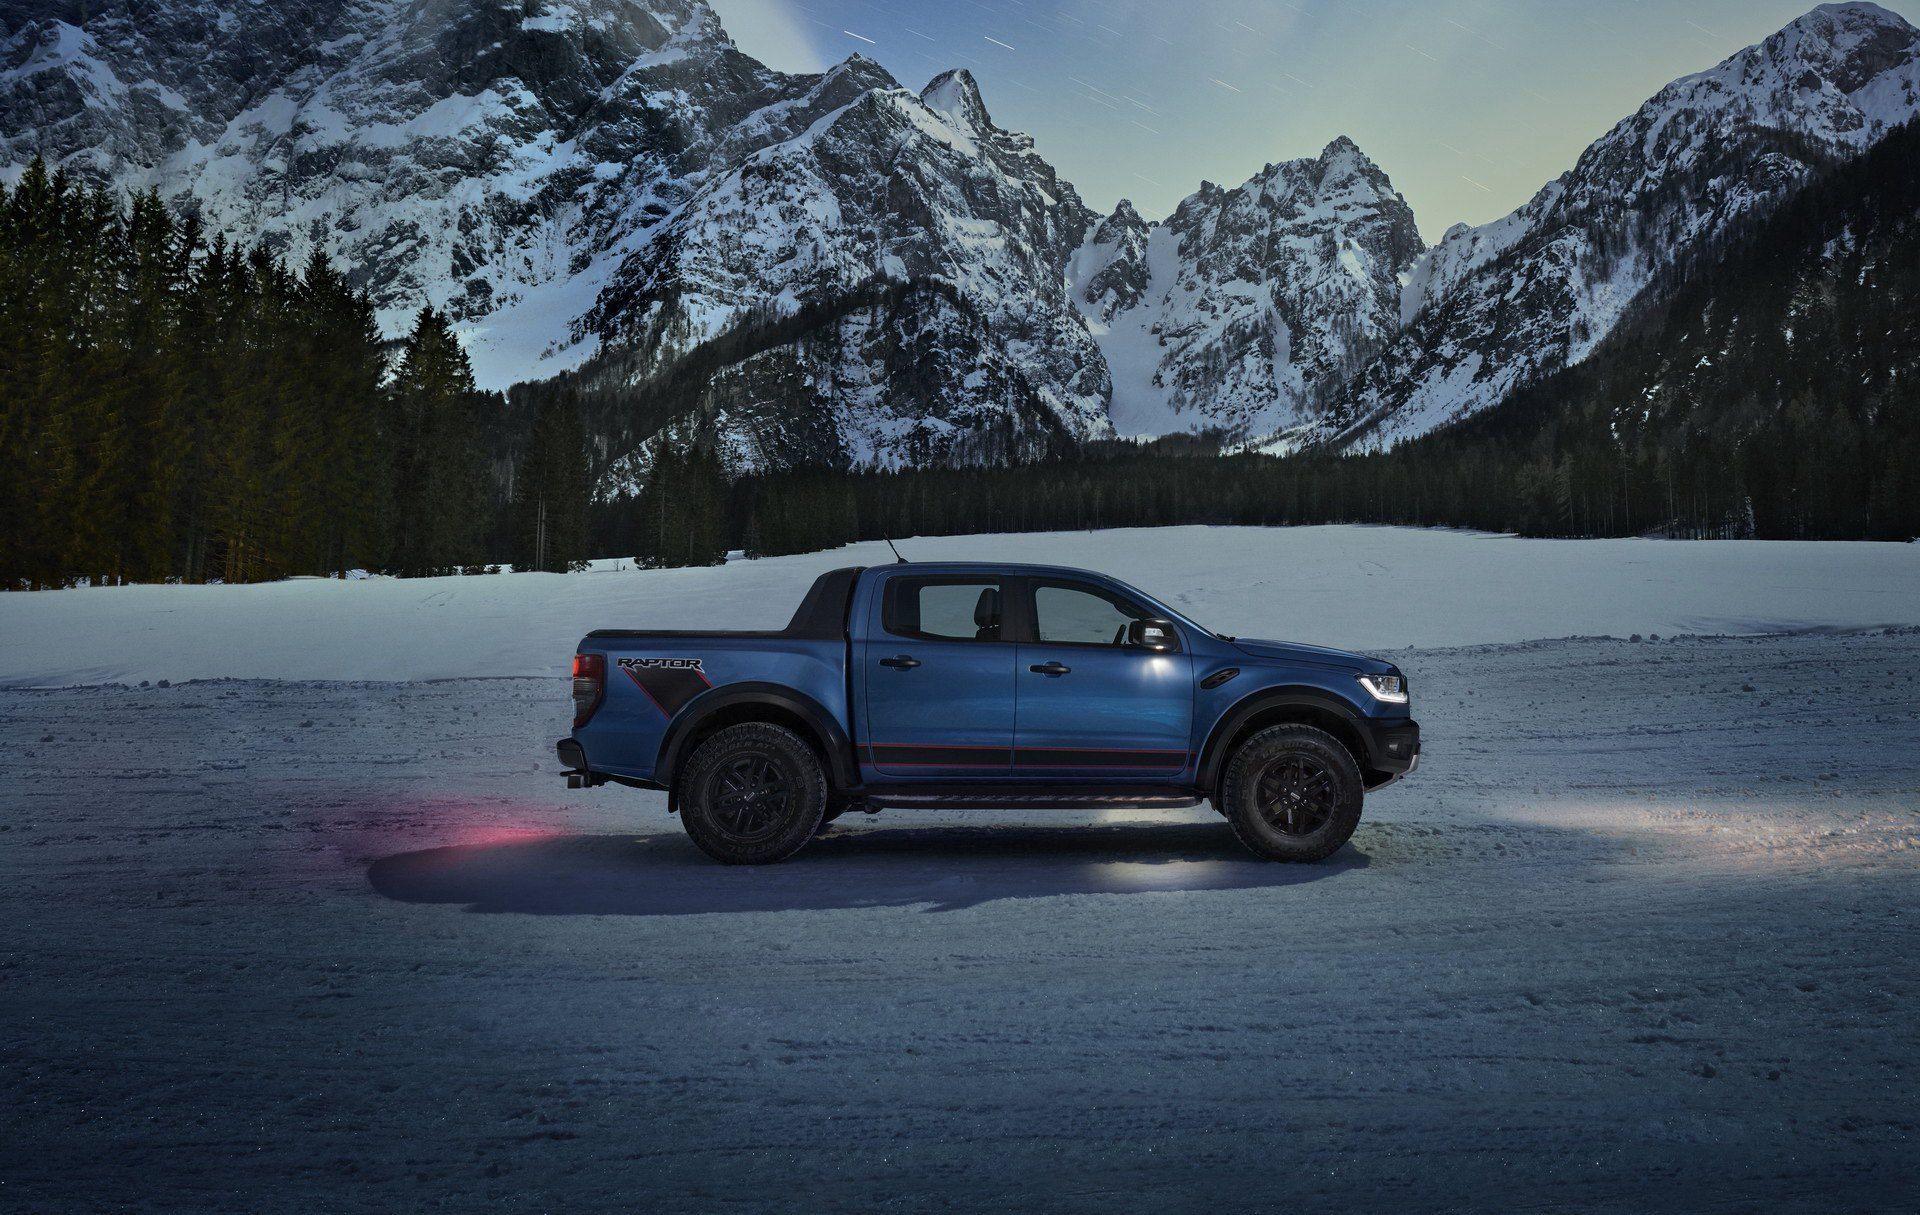 Ford_Ranger_Raptor_Special_Edition-0006